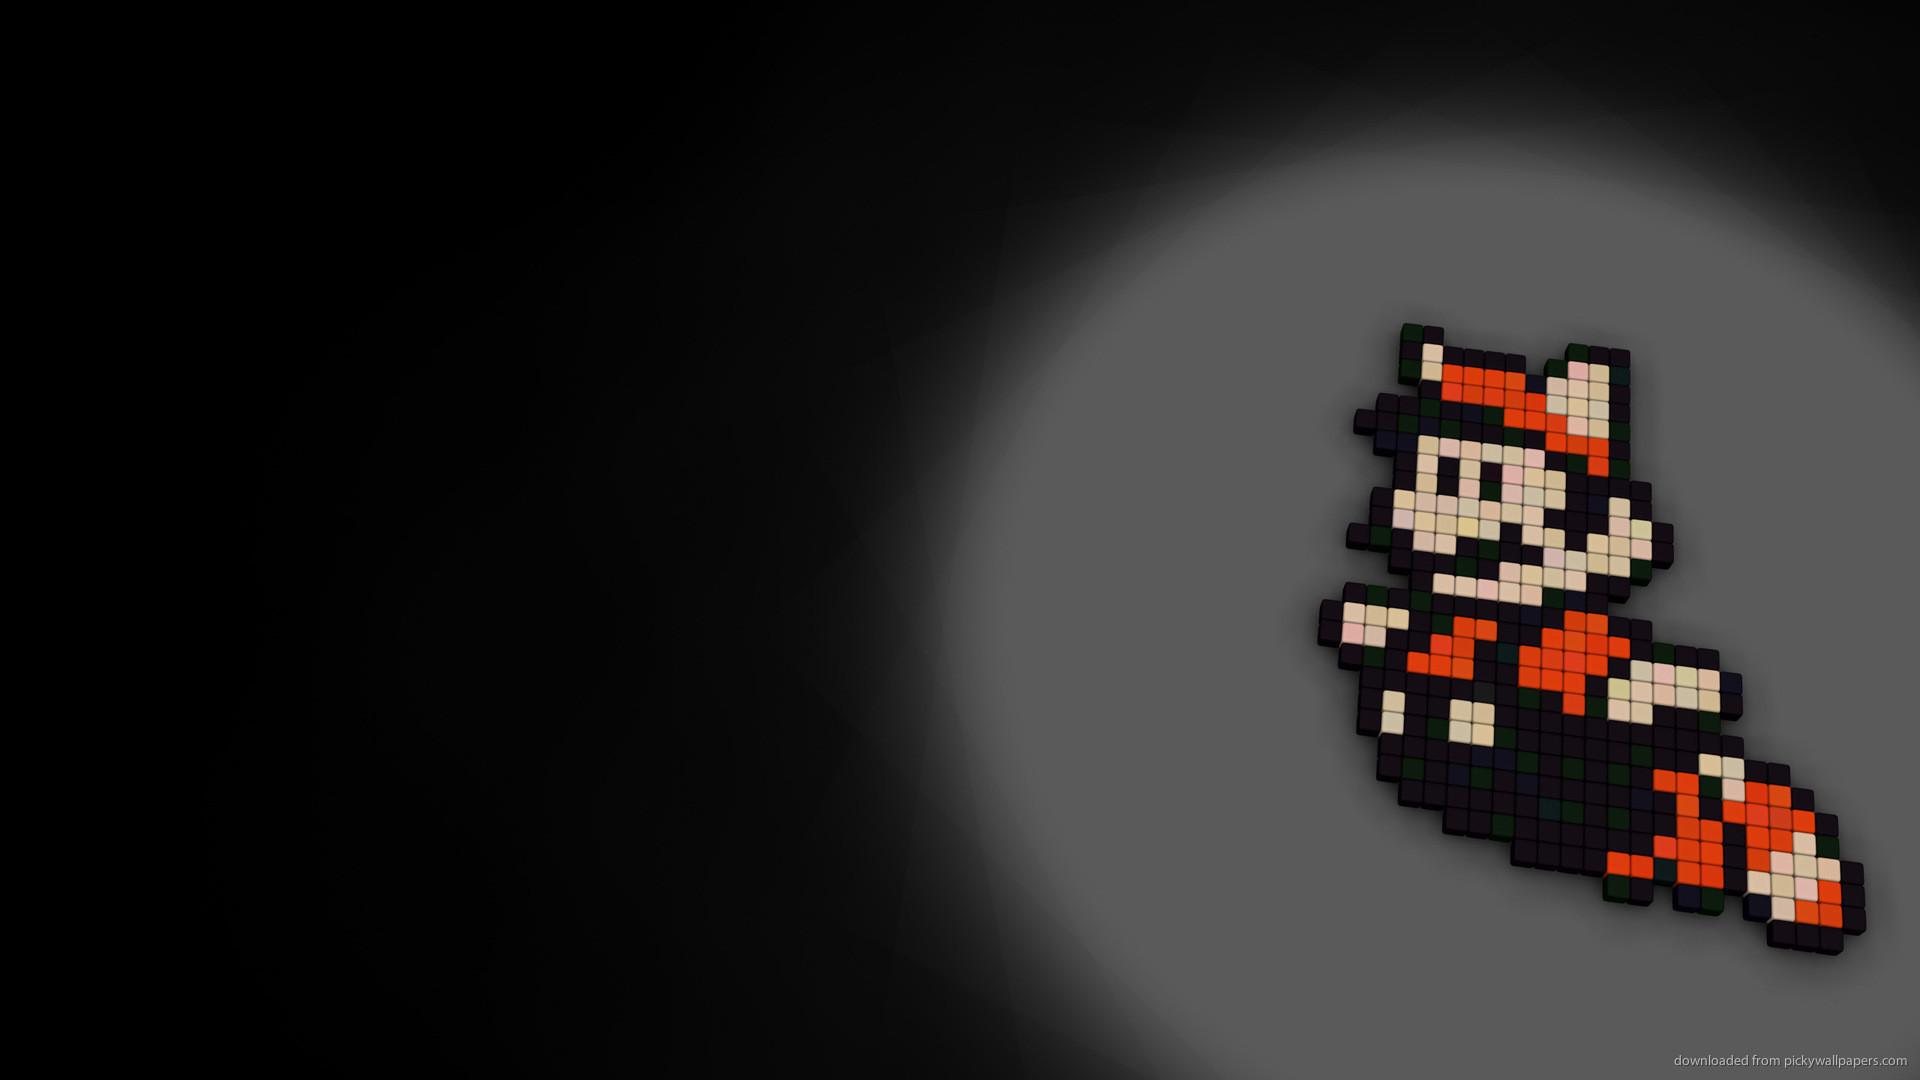 1920x1080 8-bit Mario for 1920x1080